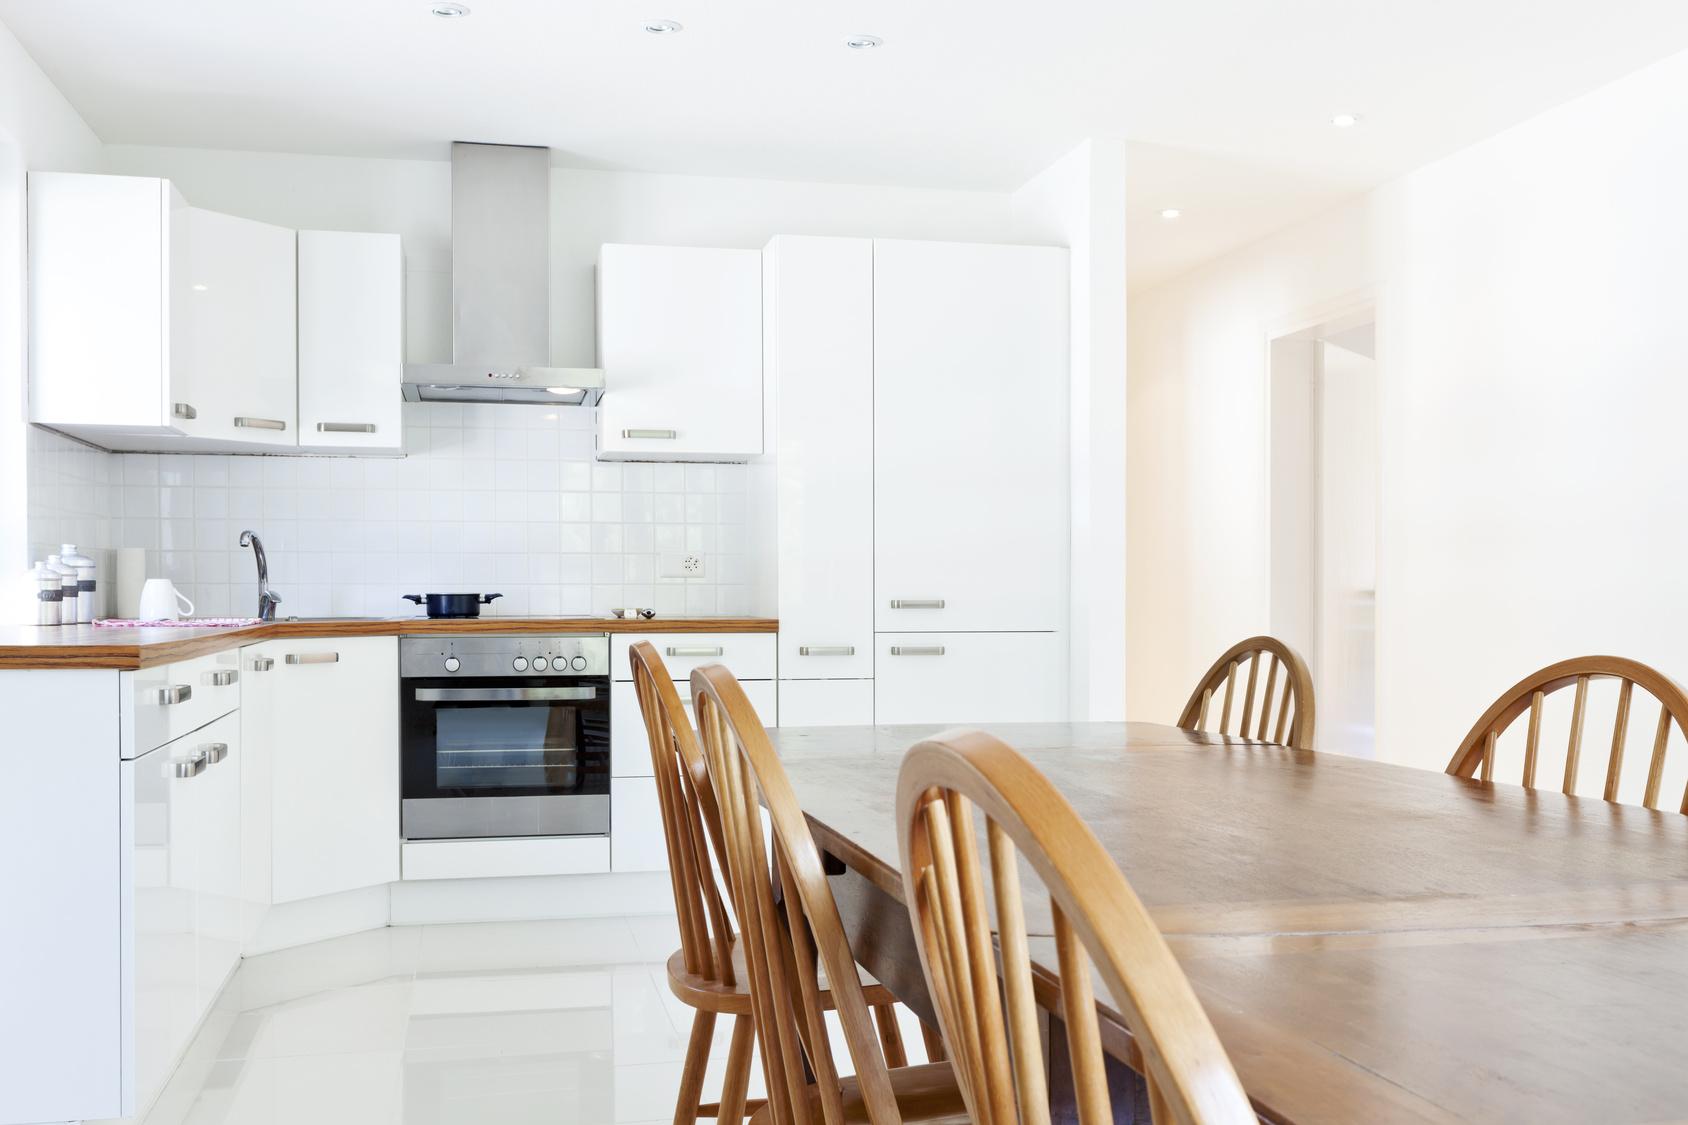 Full Size of Interior House, Large Modern Kitchen, Dining Table Küche Einbauküche L Form